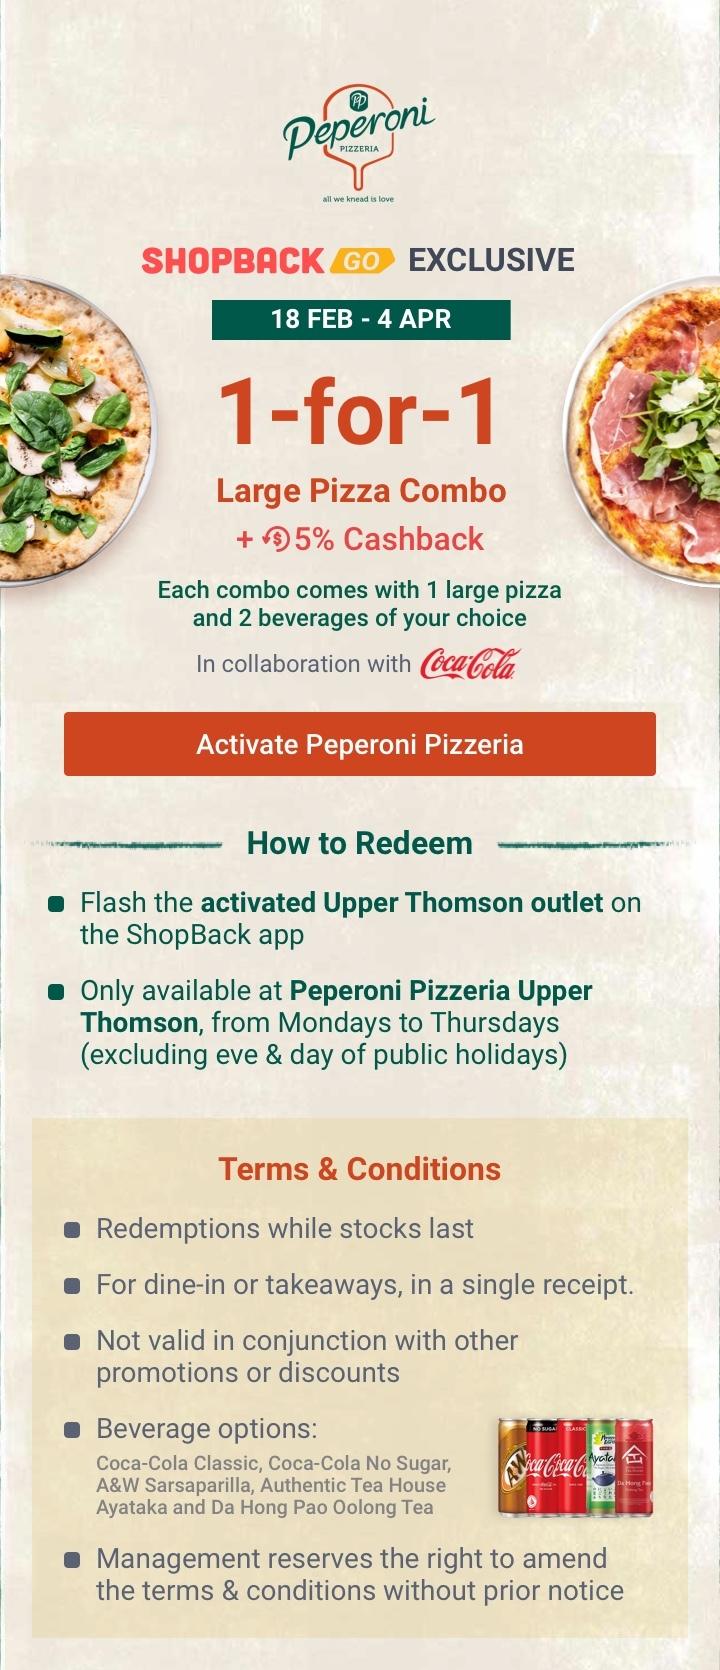 Peperoni Pizzeria 1-for-1 Pizza Combo